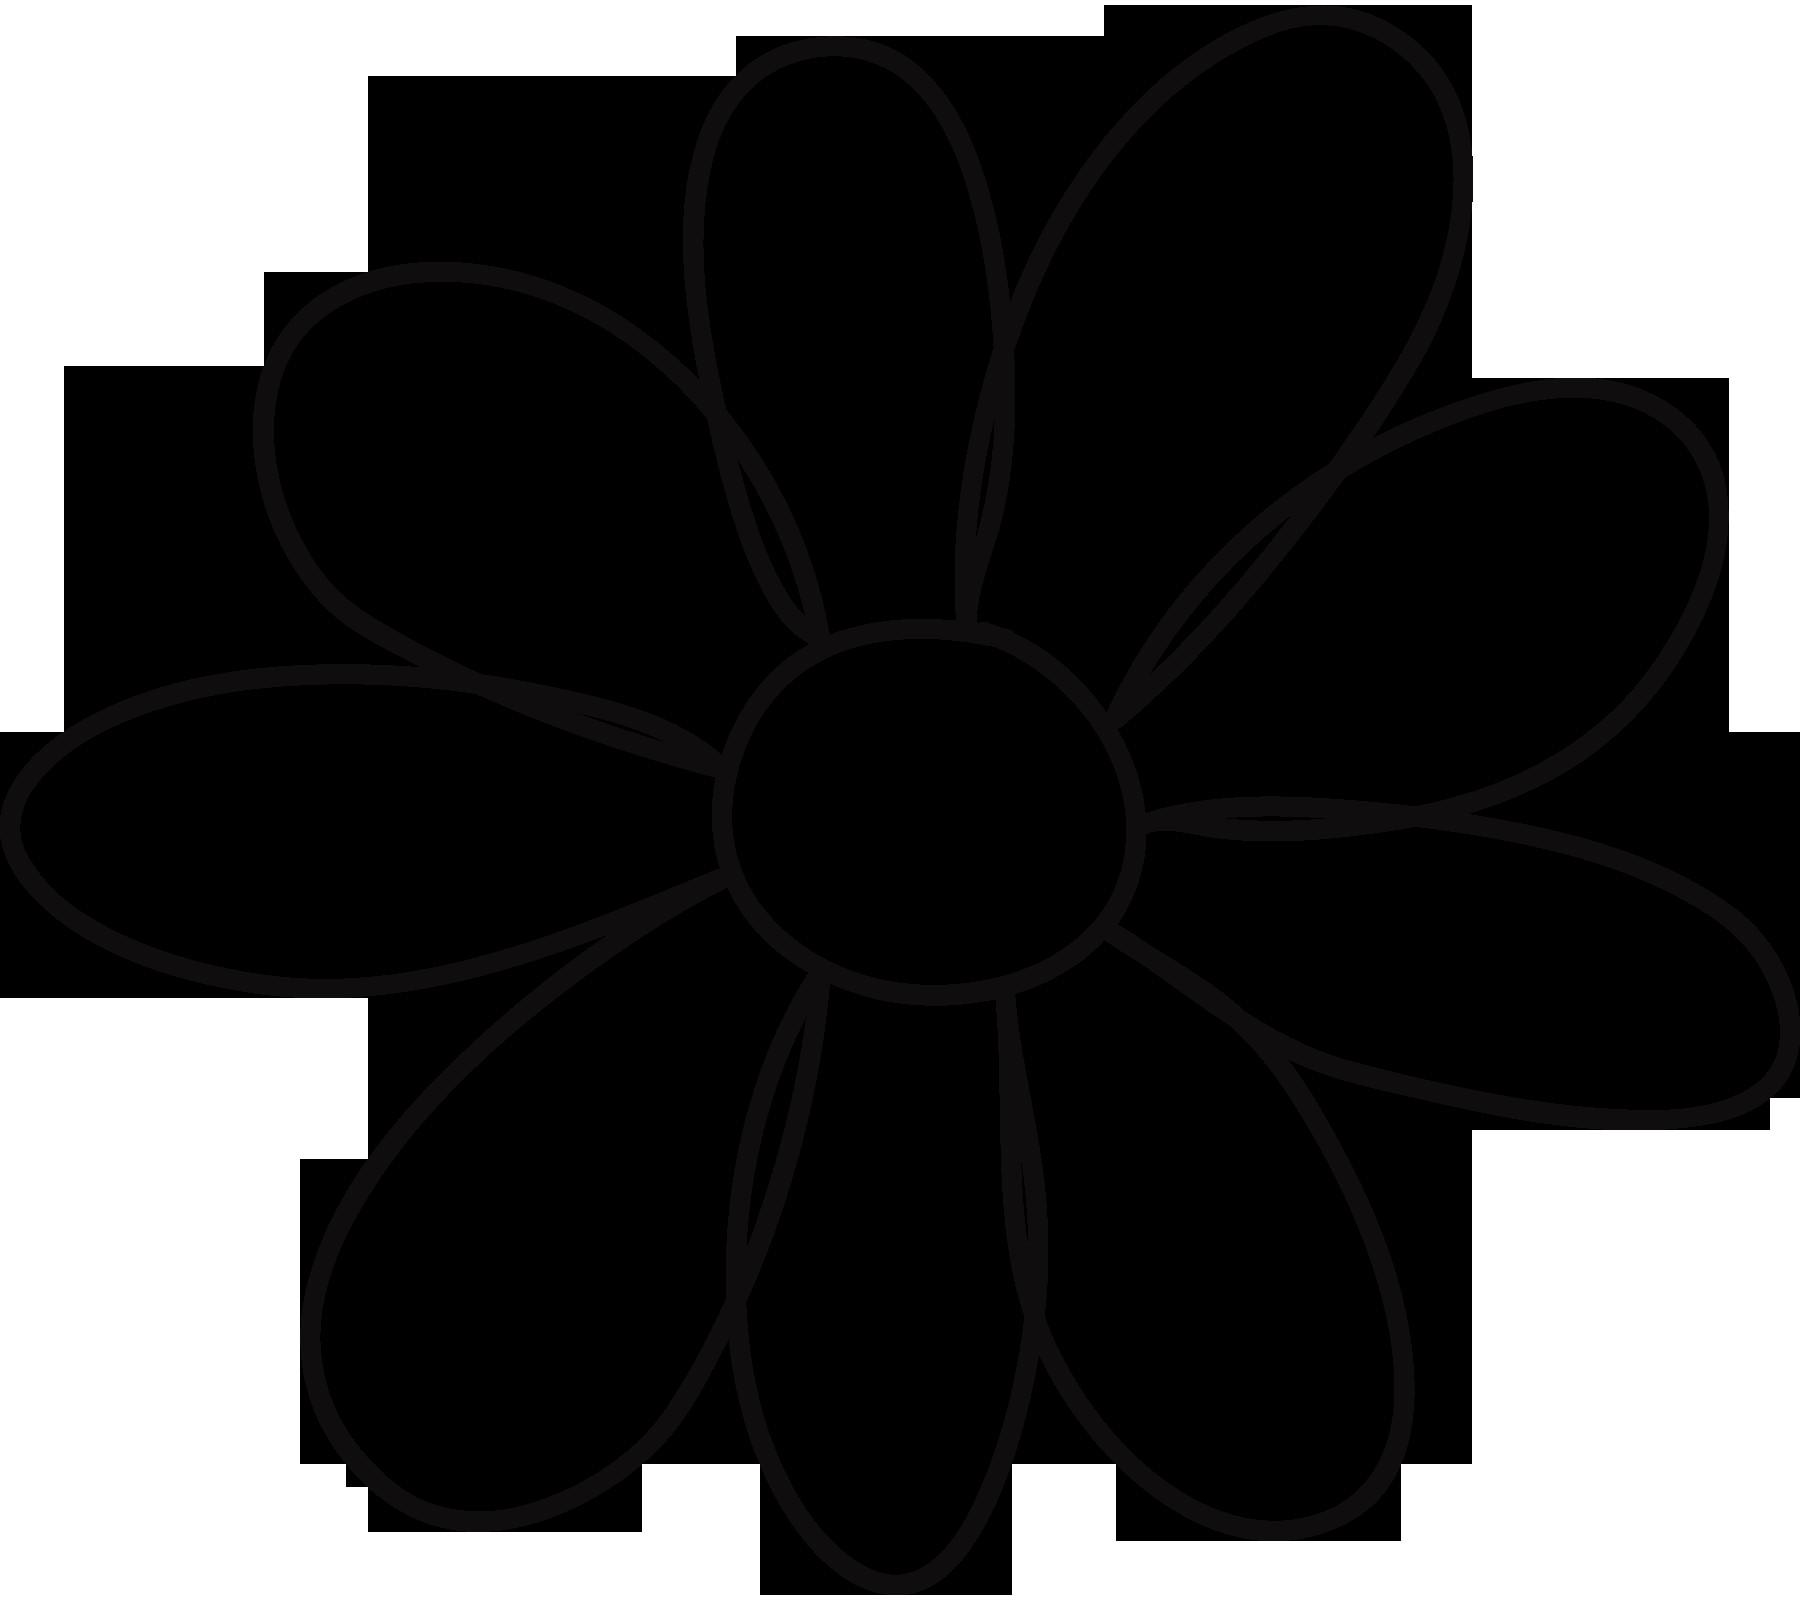 Flower Patterns to Trace Flower Patterns to Trace Clipart Best